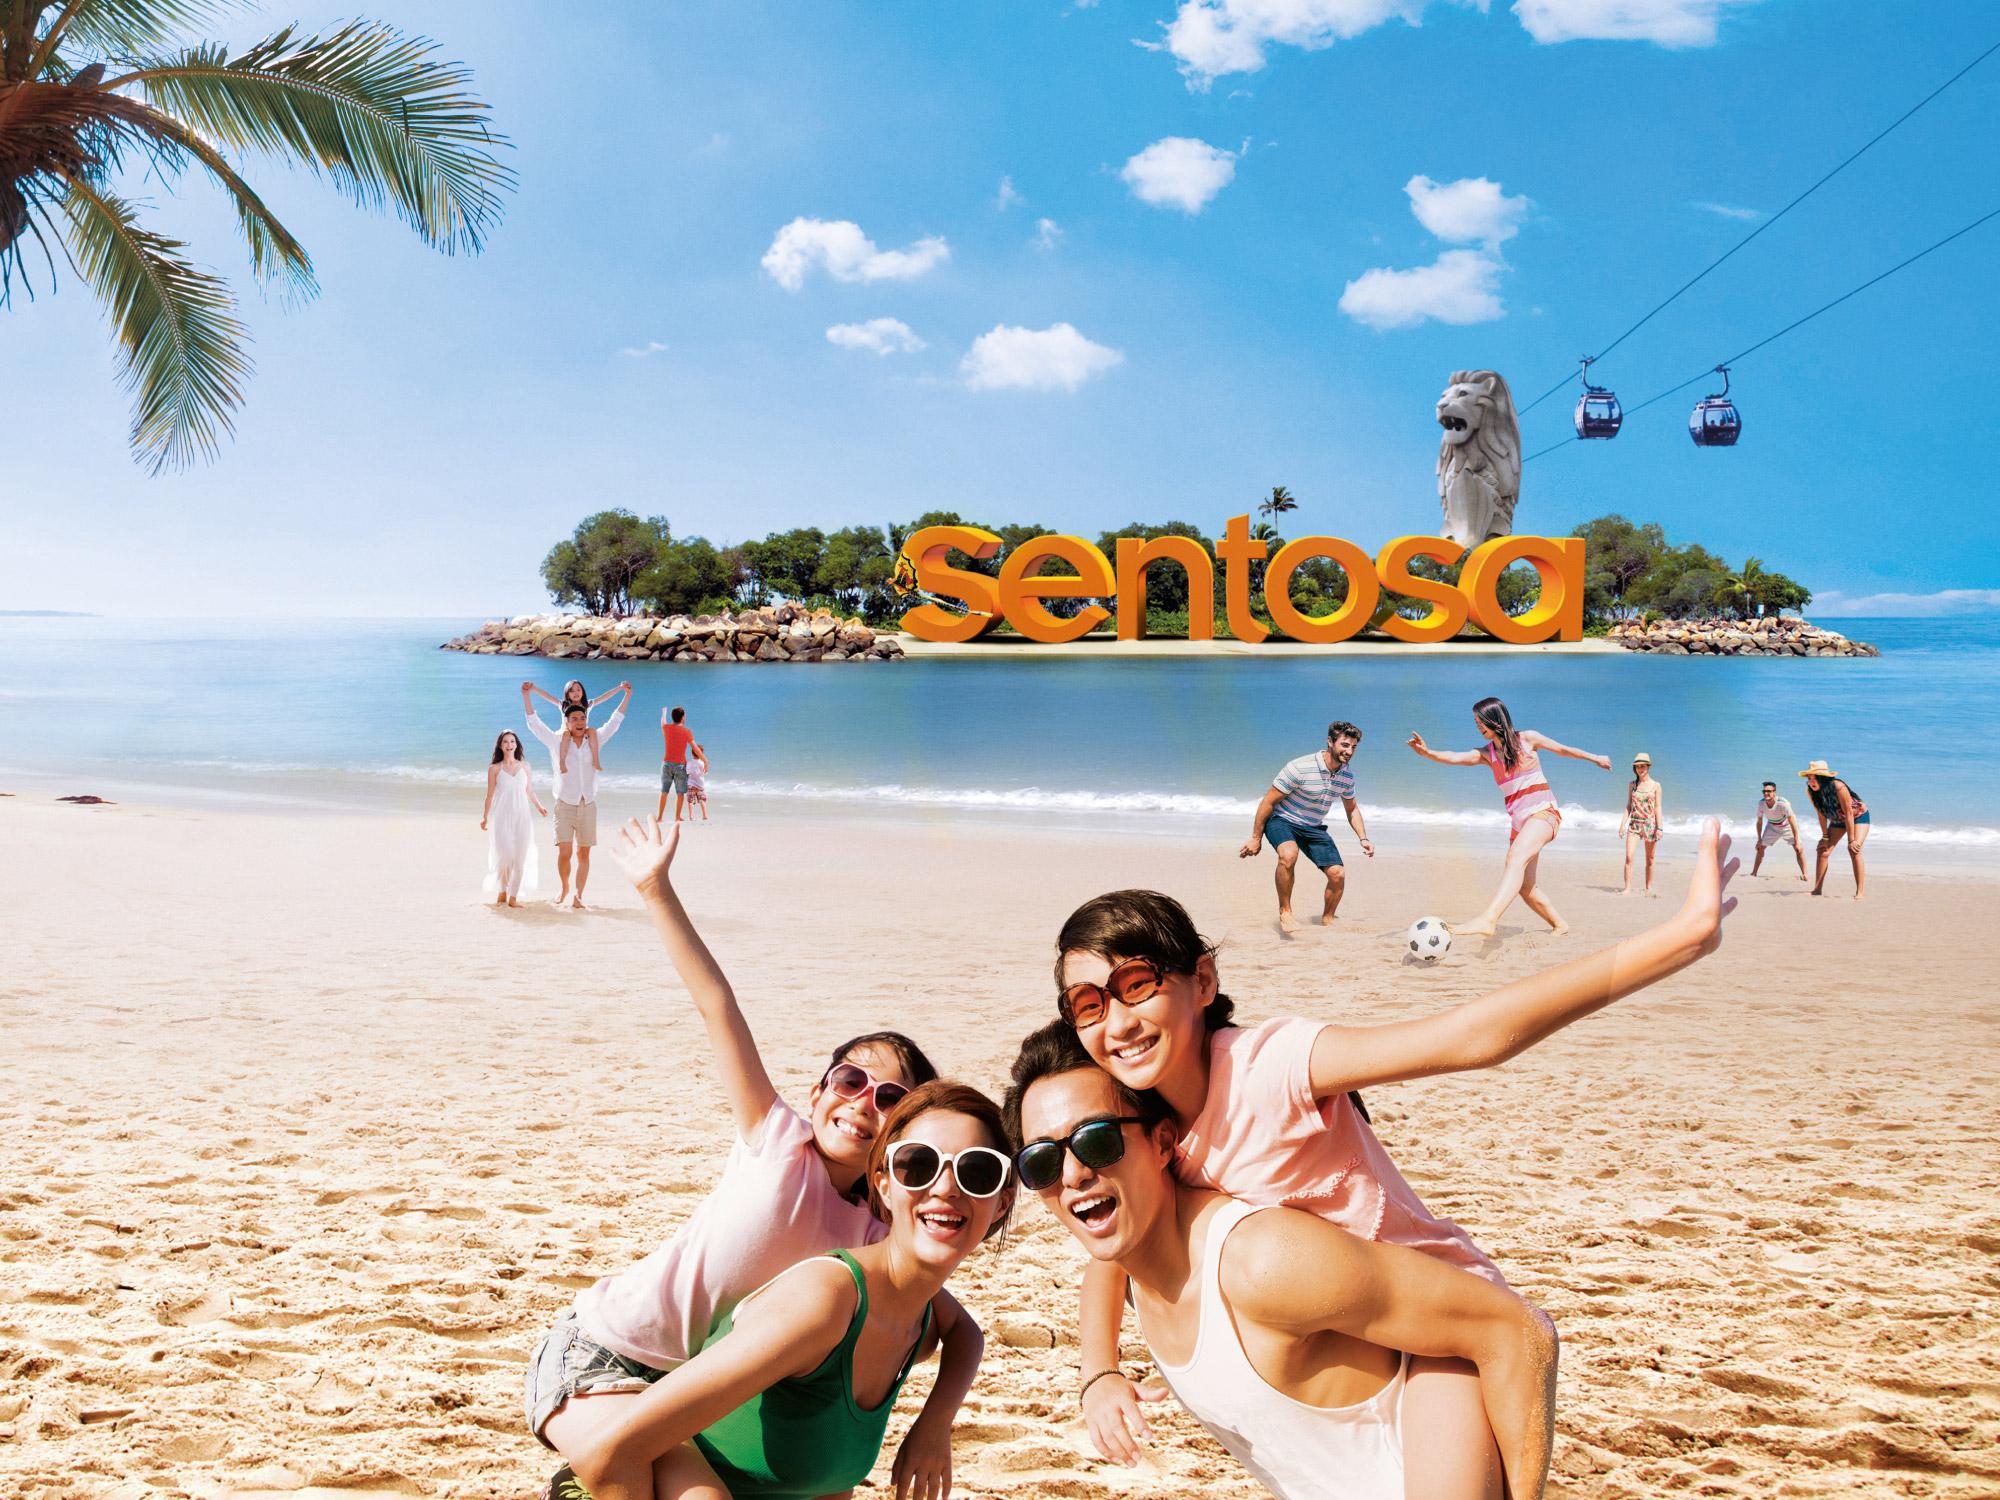 Sentosa, The State of Fun